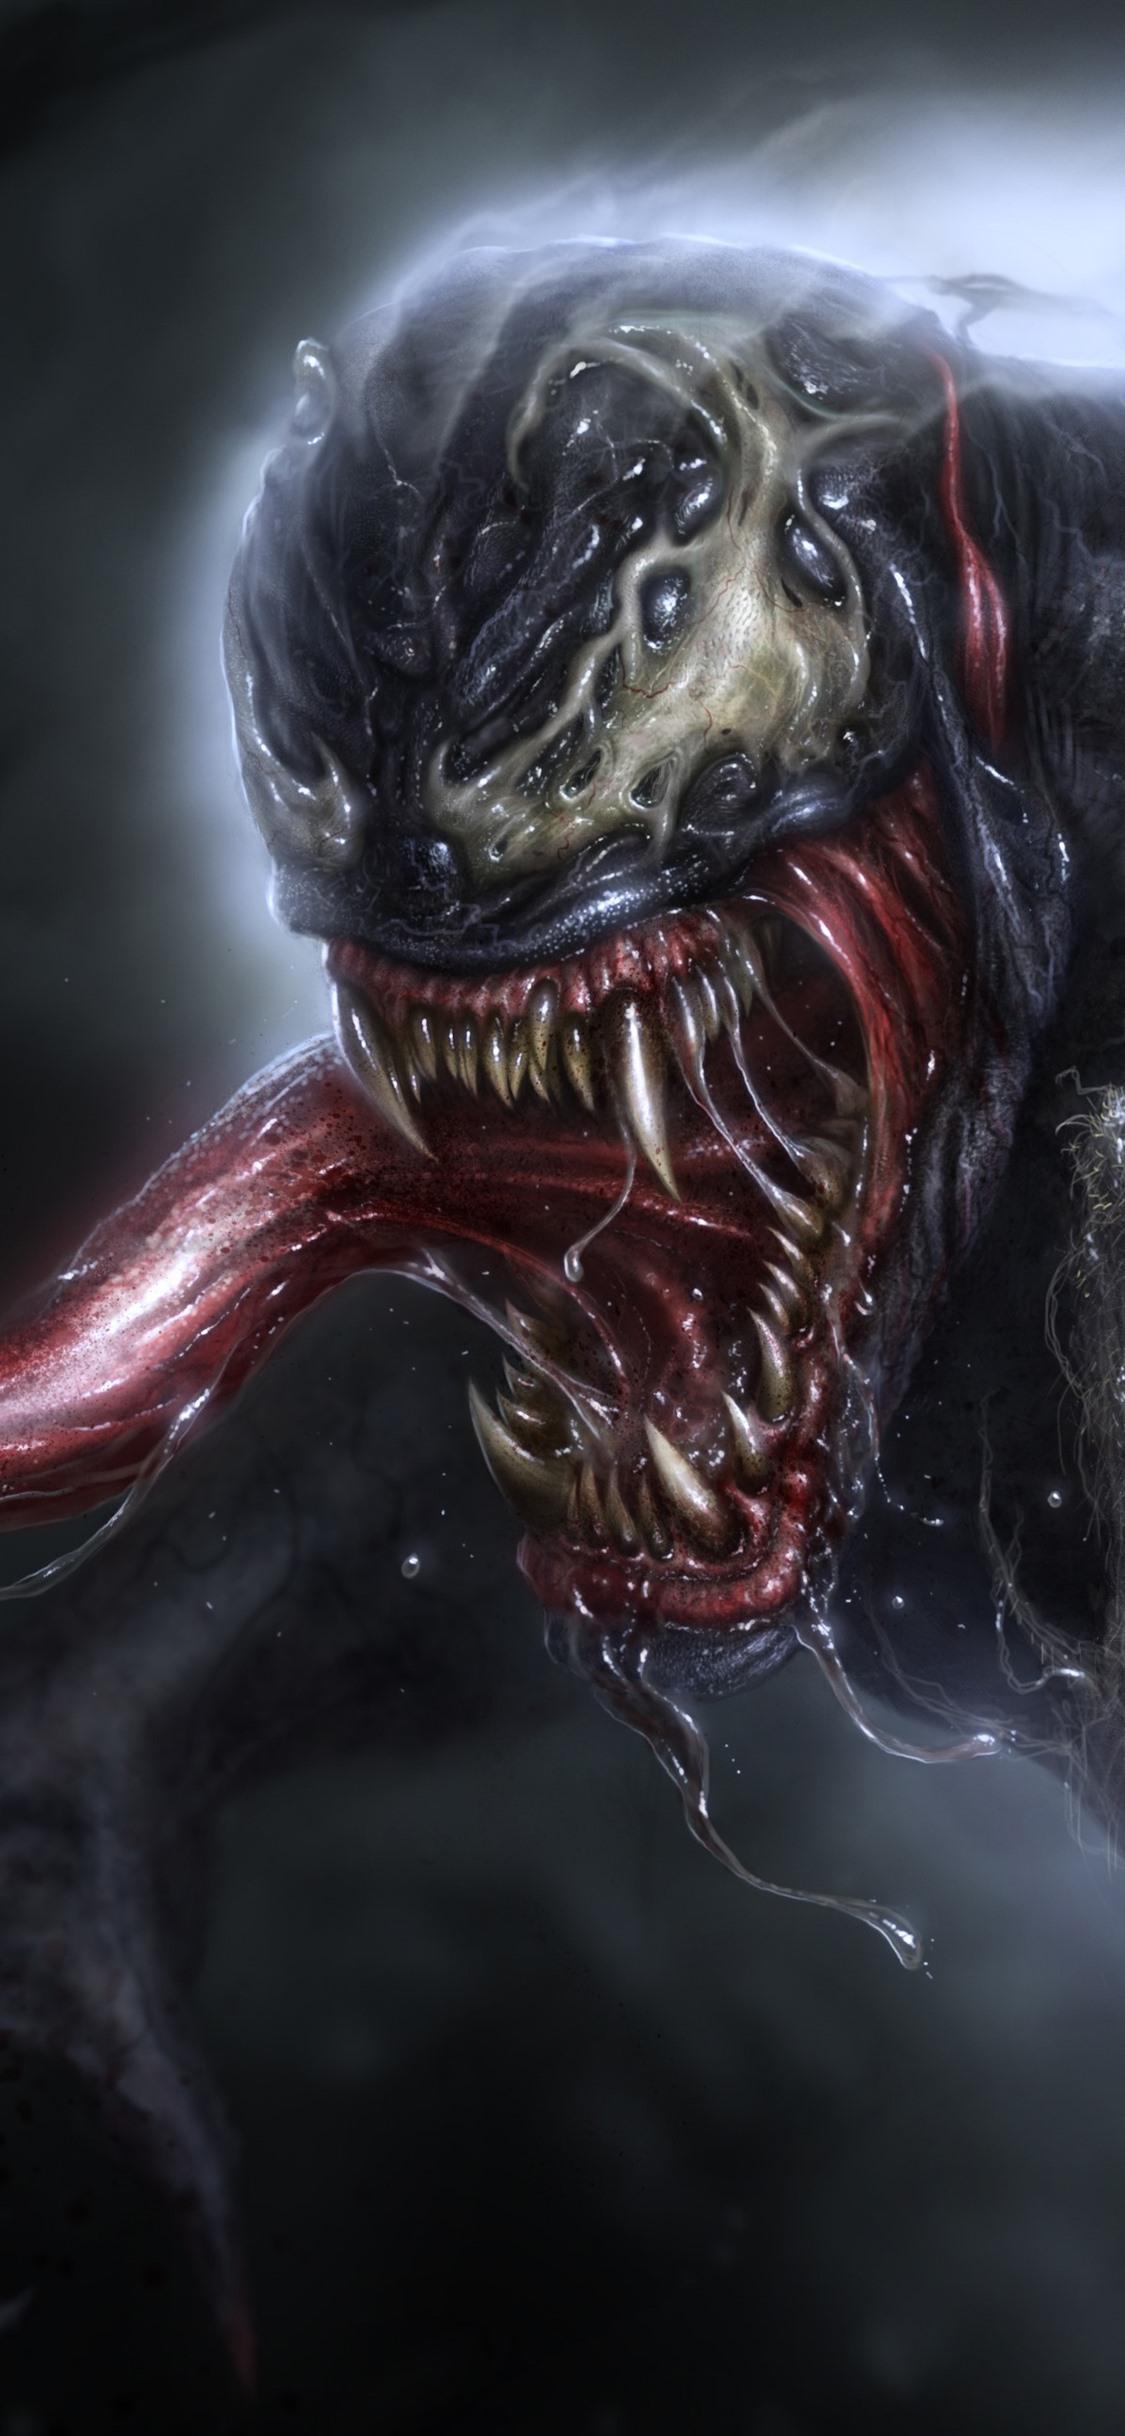 Venom Drool Marvel Comics 1125x2436 Iphone Xs X Wallpaper